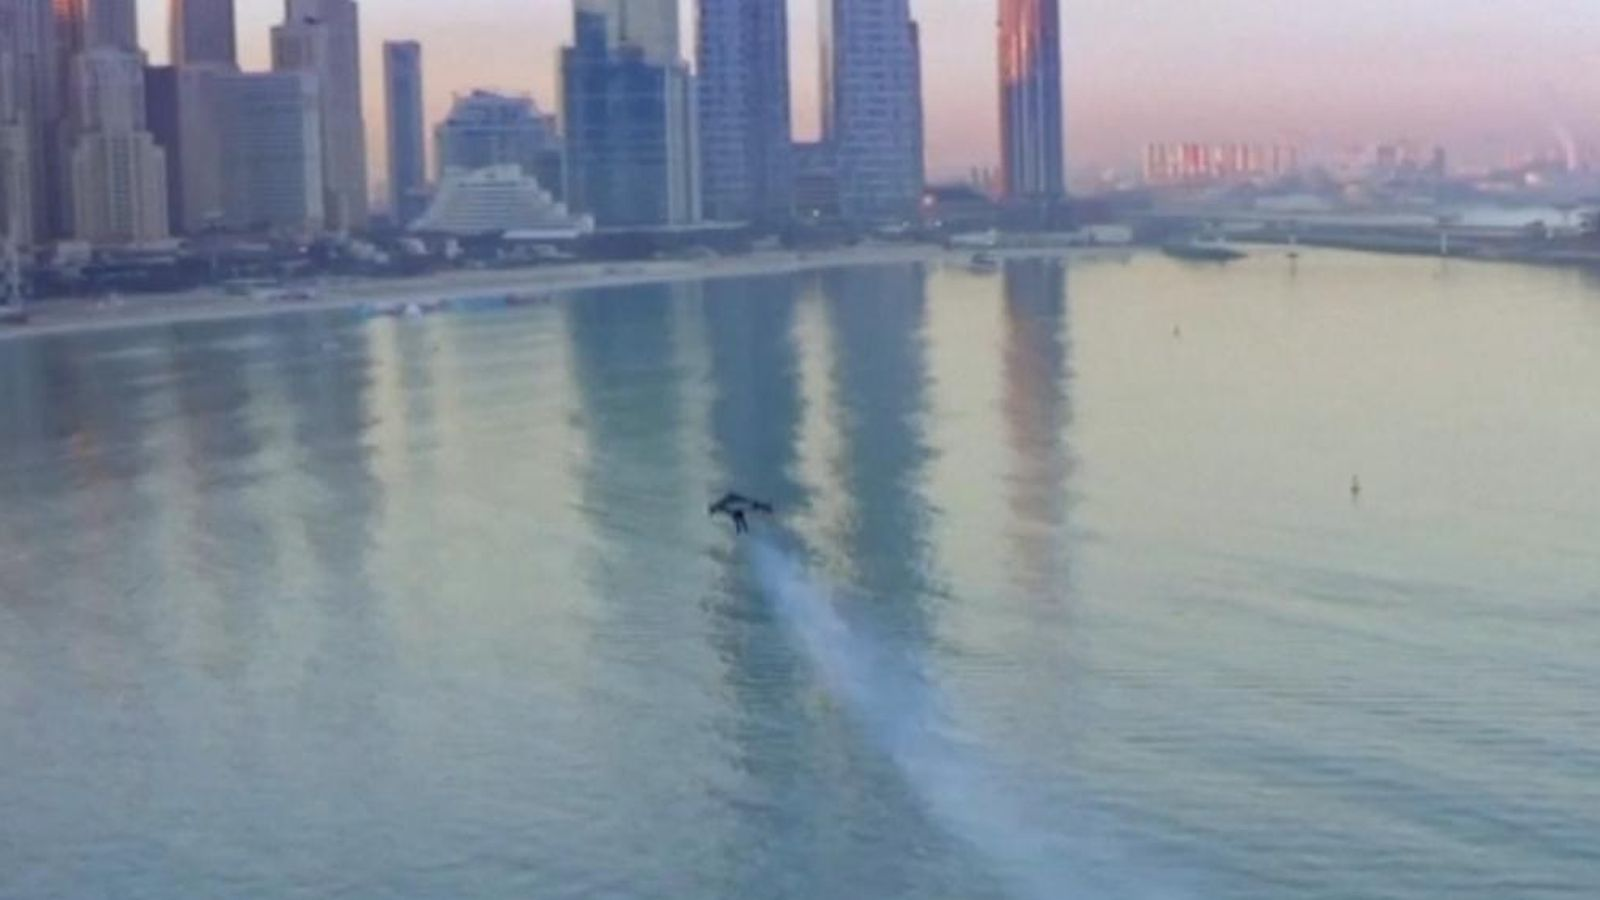 Jetman soars high above Dubai skyscrapers in breathtaking solo flight